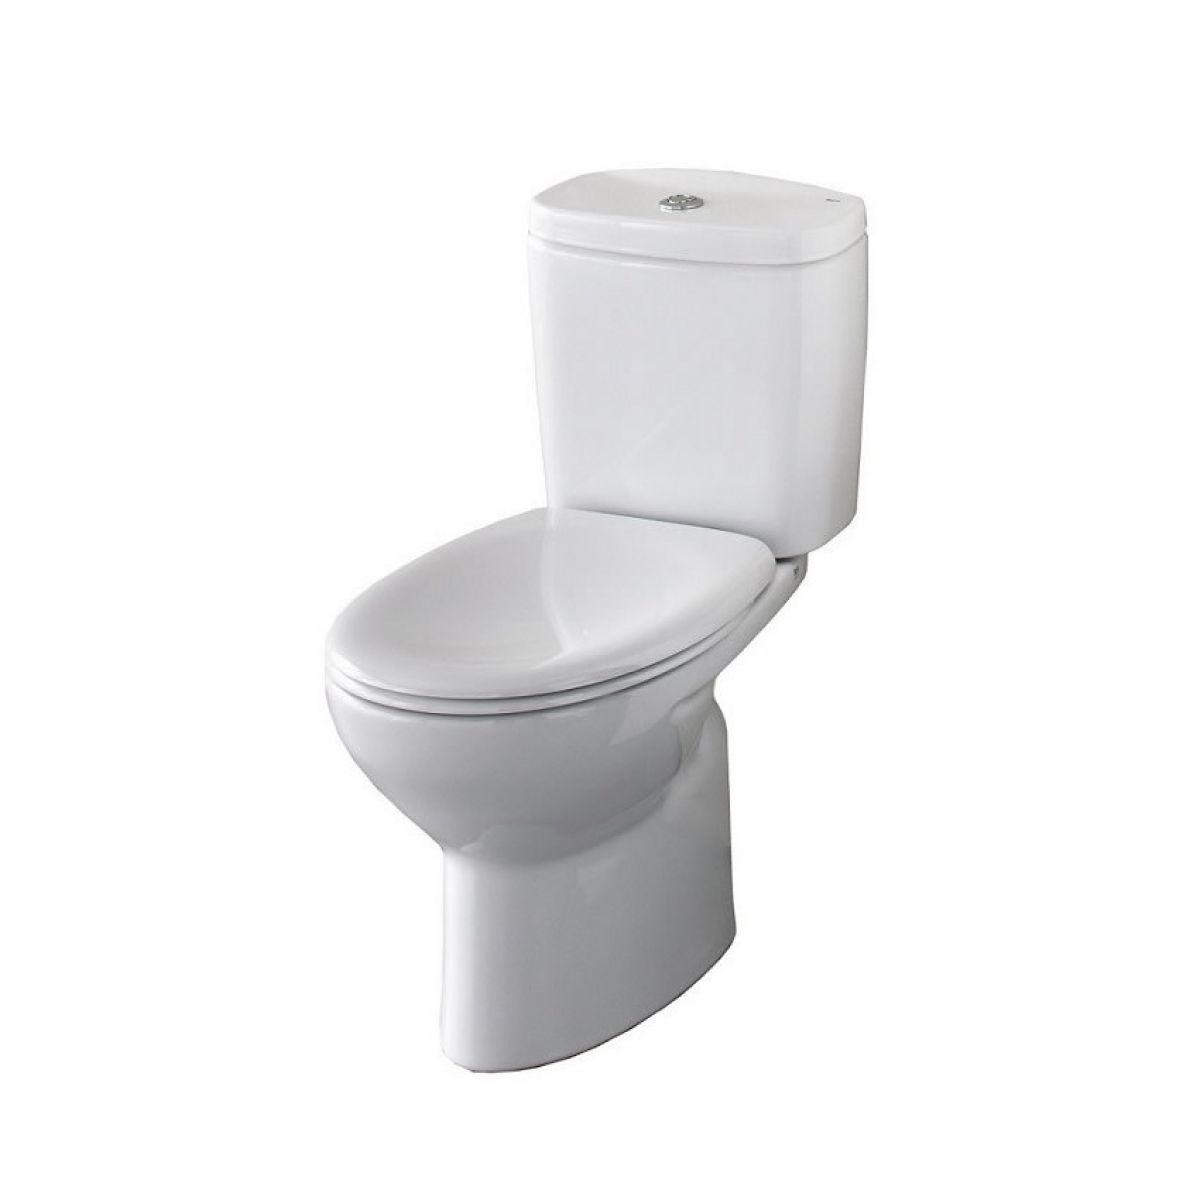 roca laura super eco toilet suite uk bathrooms. Black Bedroom Furniture Sets. Home Design Ideas